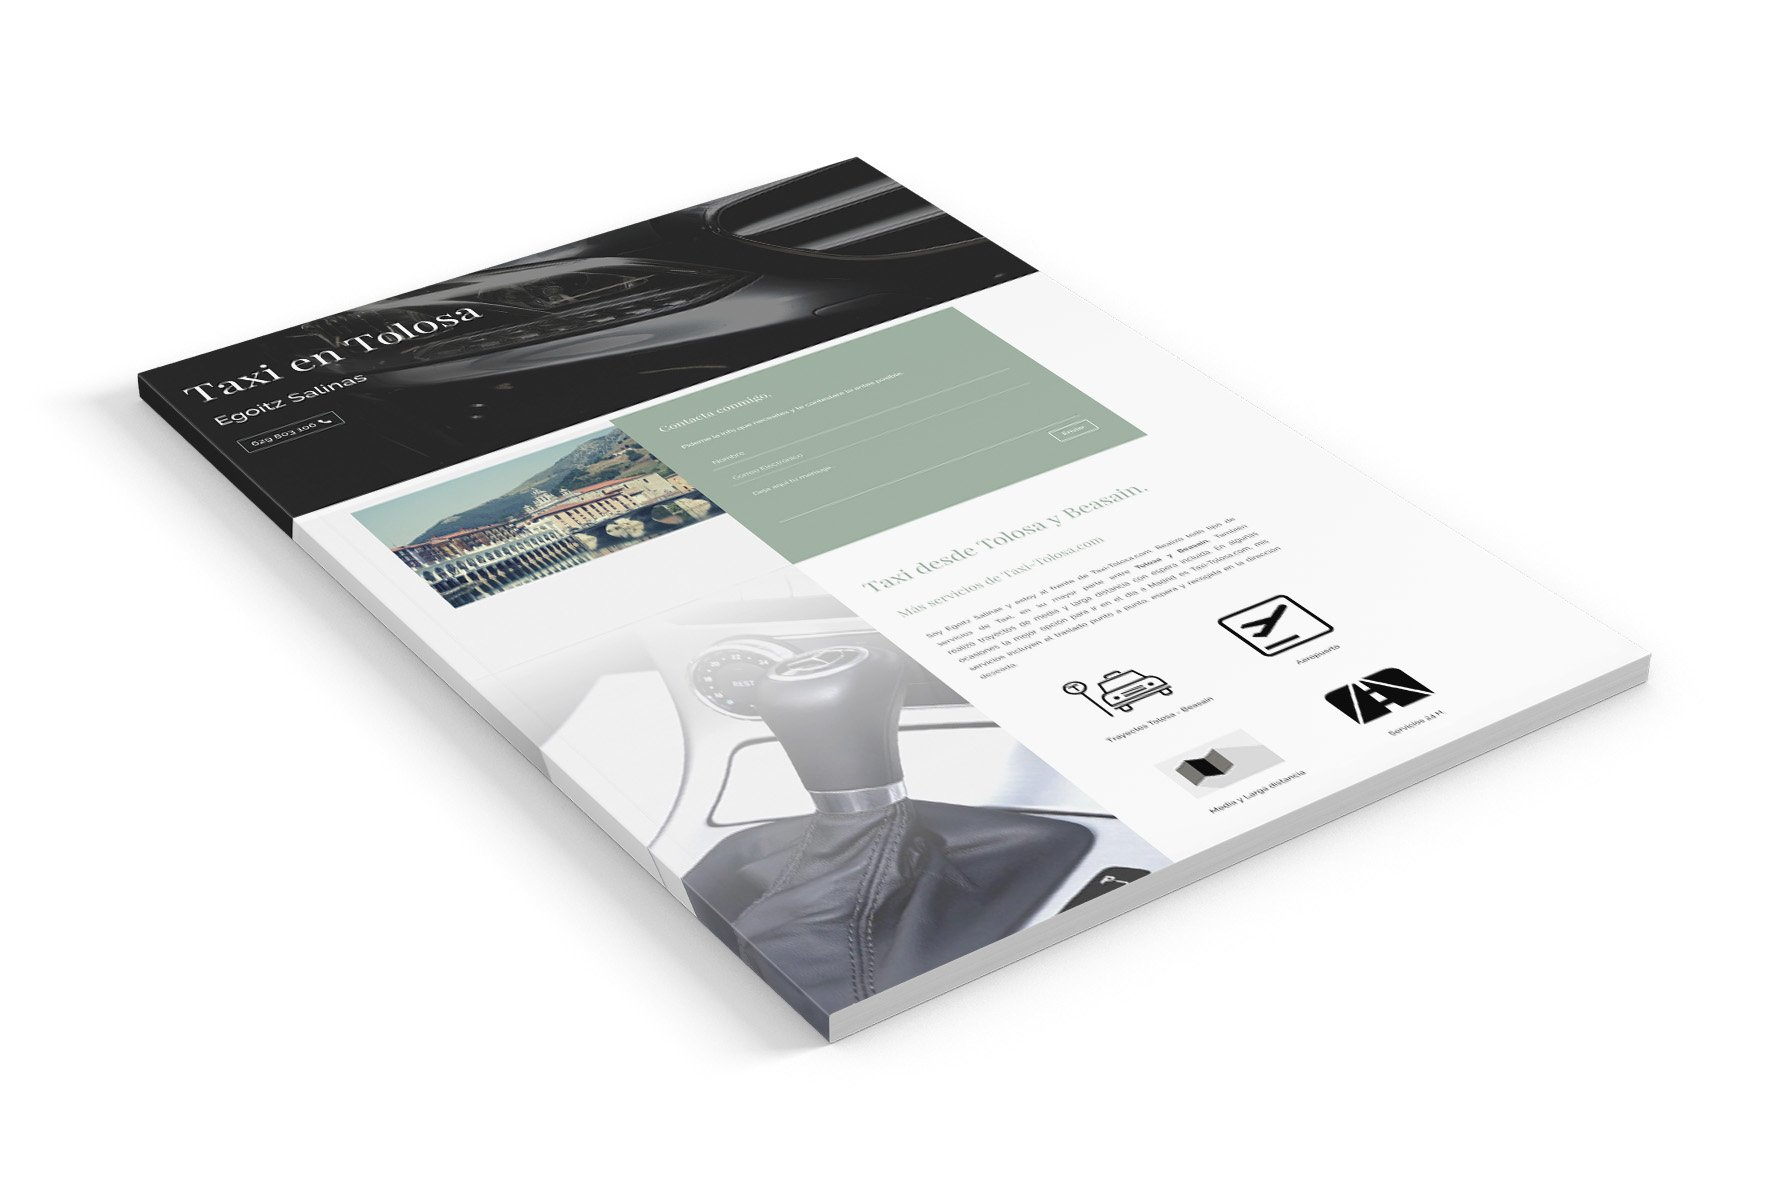 proyecto portfolio taxi-tolosa.com diseño web en gipuzkoa seik 2